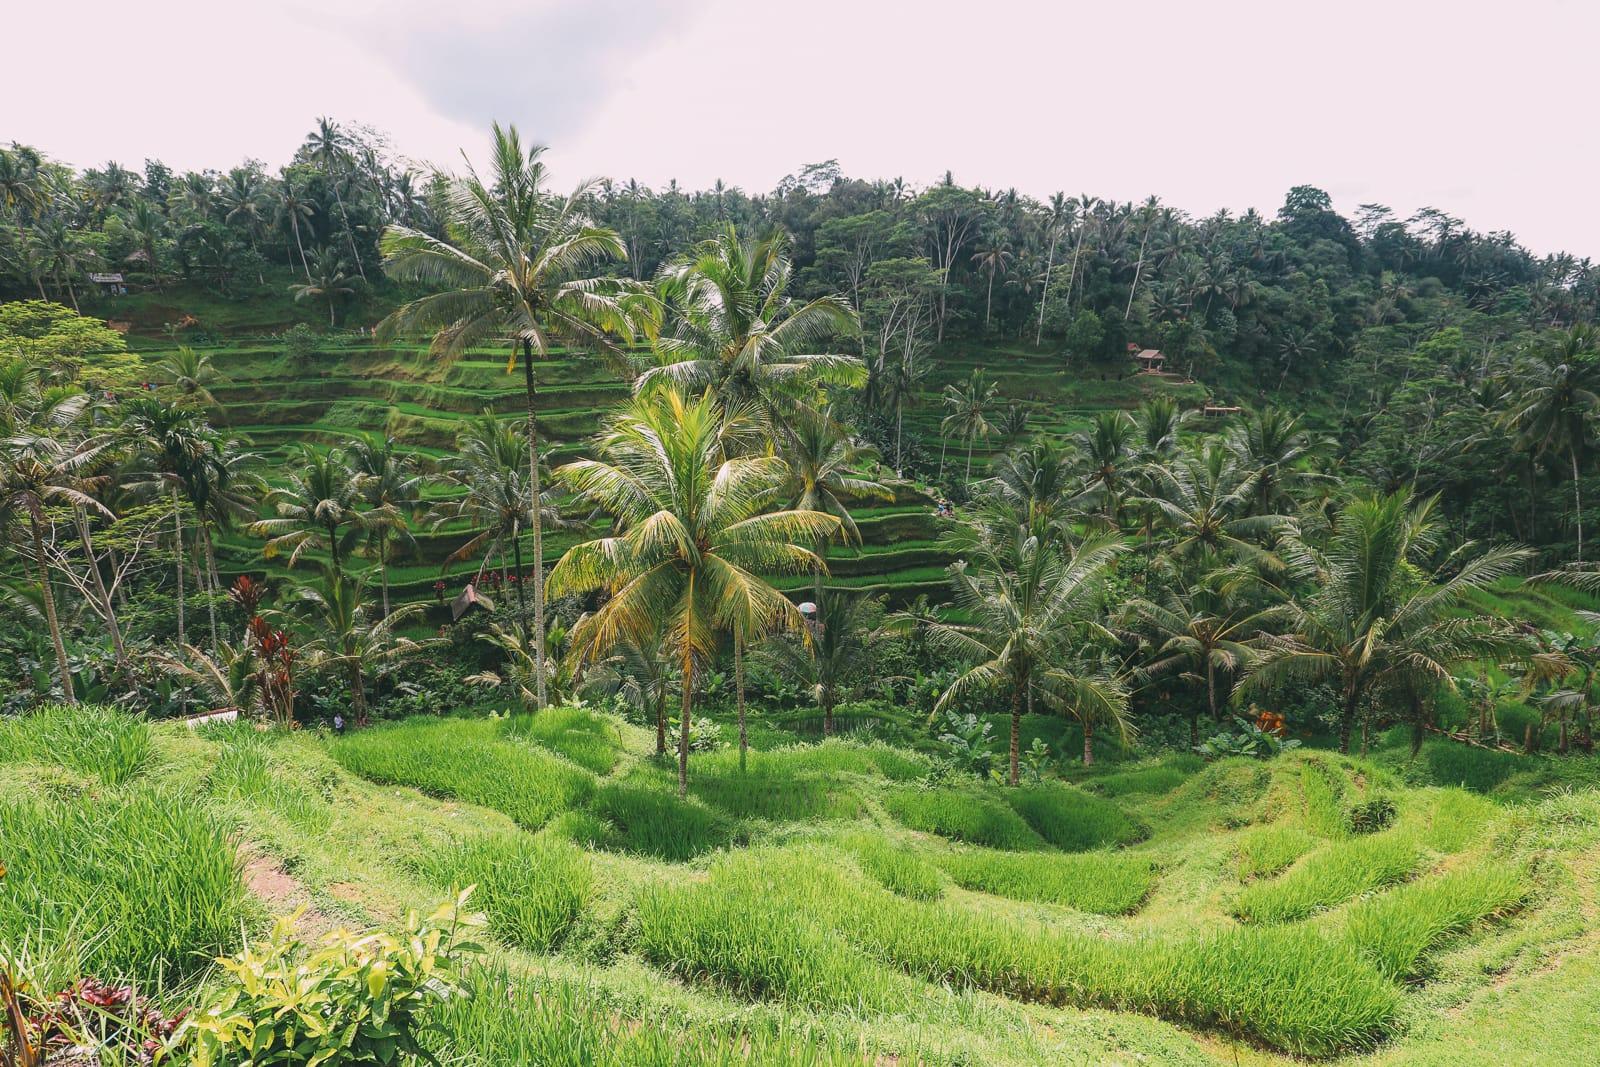 Bali Travel - Tegalalang Rice Terrace In Ubud And Gunung Kawi Temple (4)